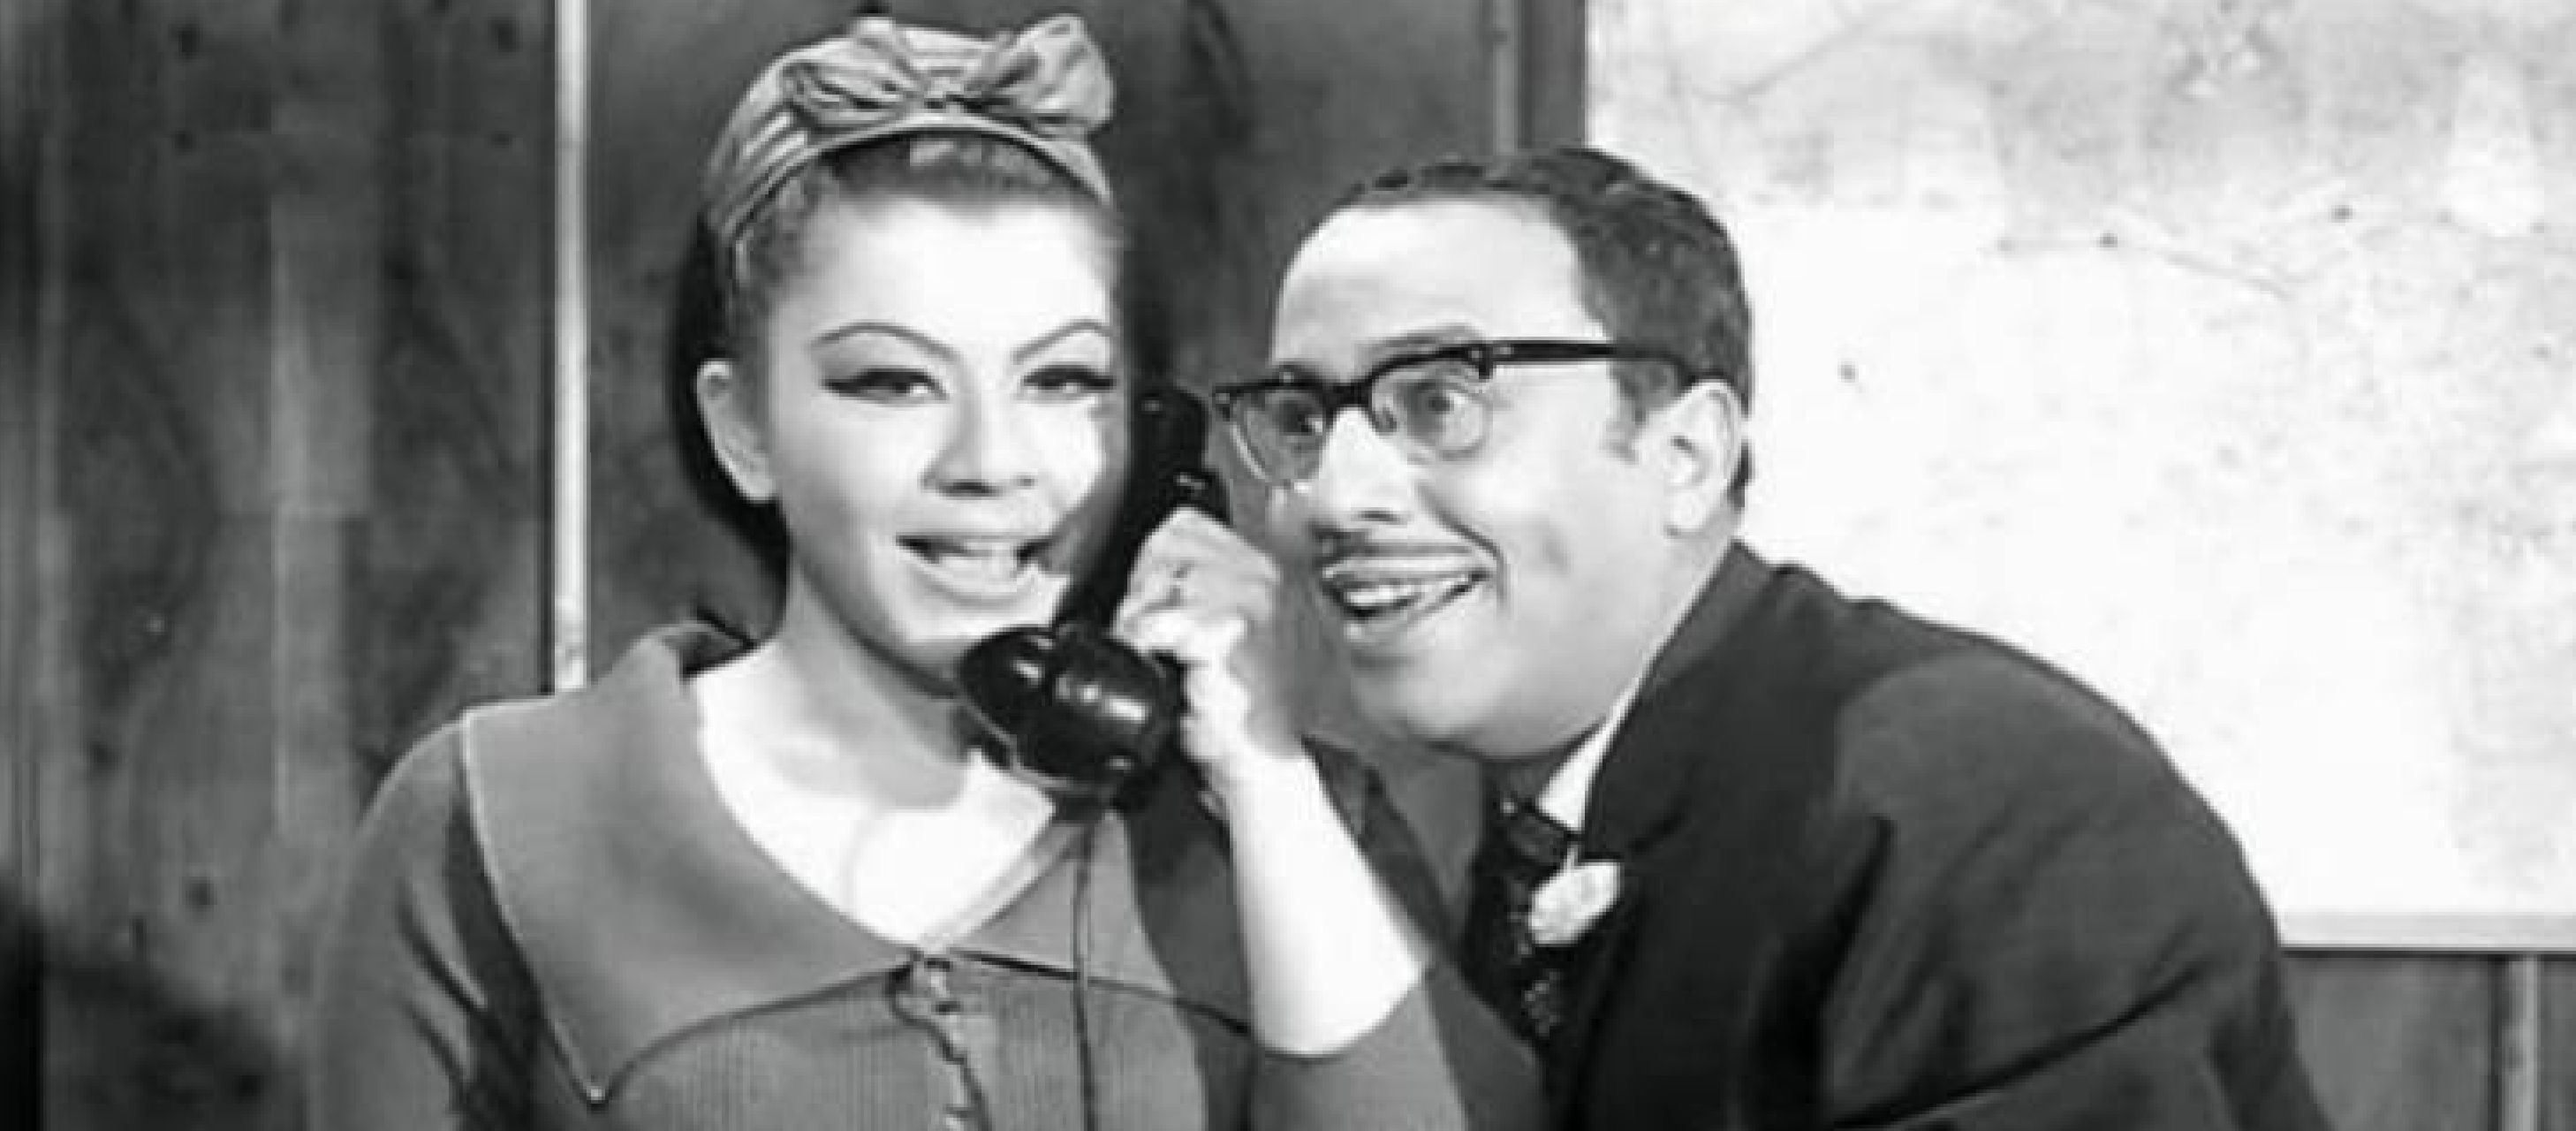 Breaking: Egypt's veteran actress Shwikar passes away at 85